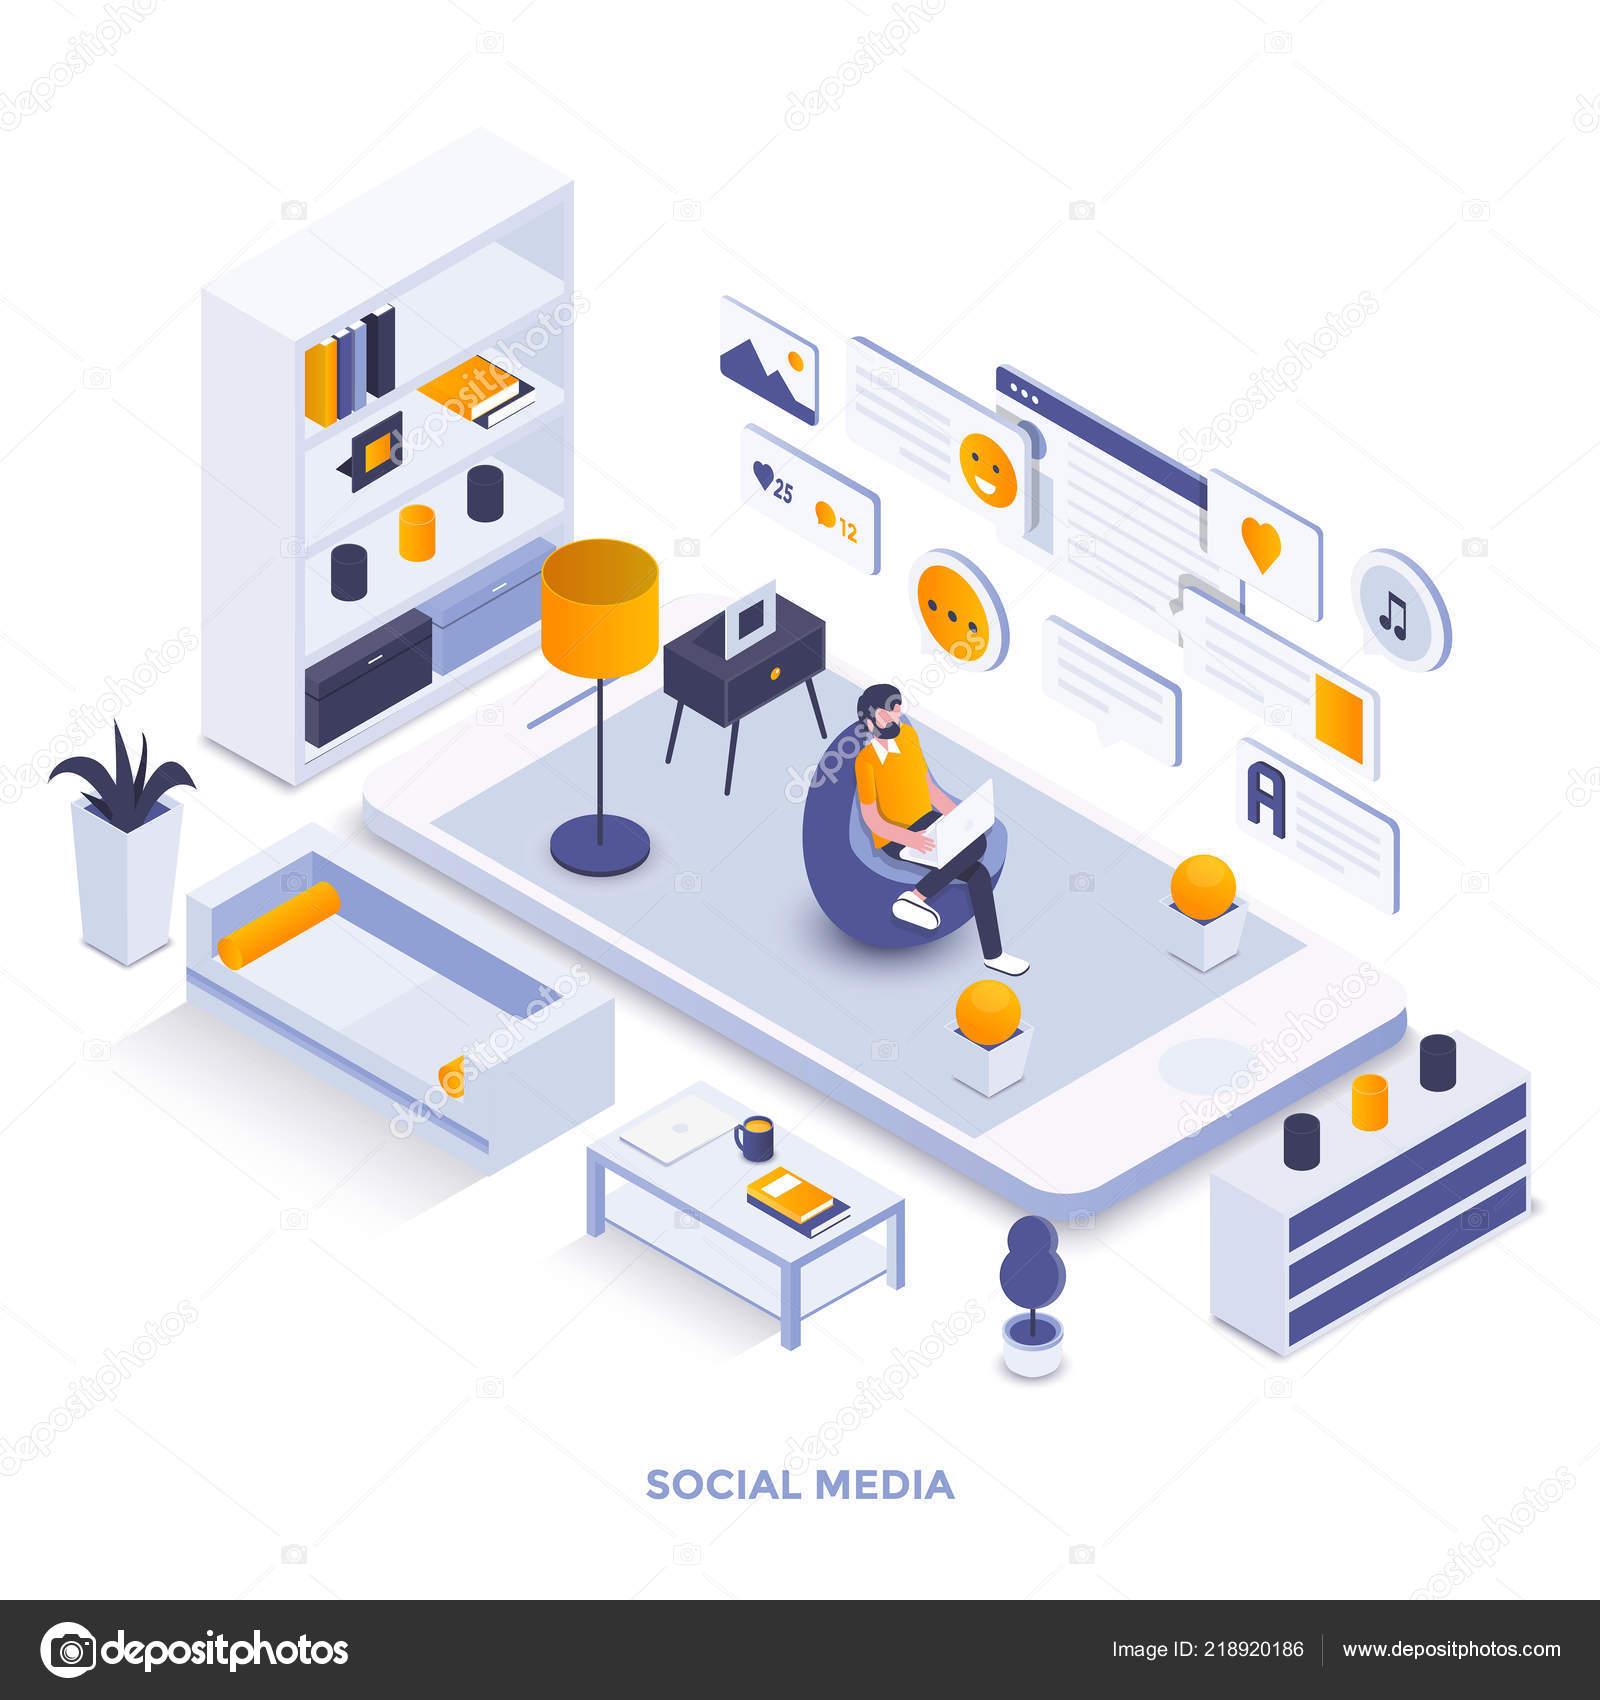 Modern Flat Design Isometric Illustration Social Media Can